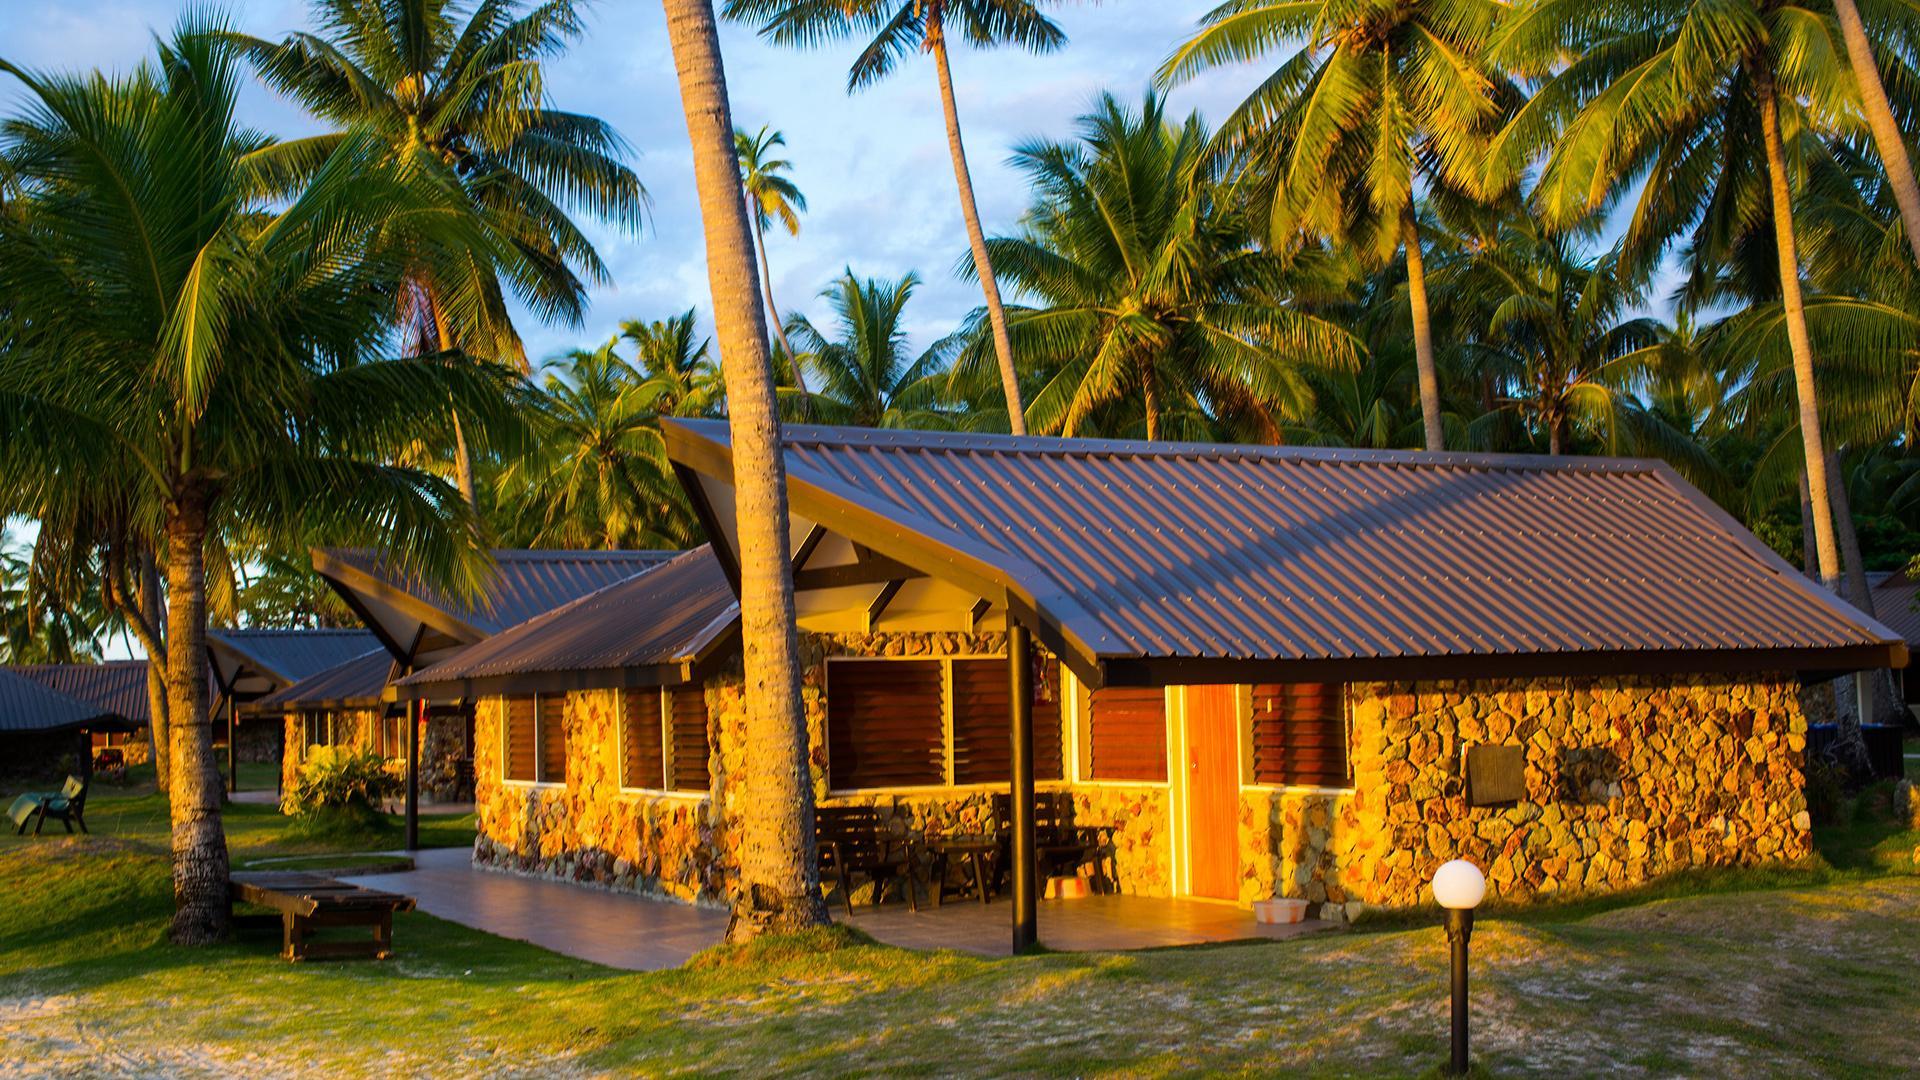 Beachfront Bure image 1 at Plantation Island Resort by null, Western Division, Fiji